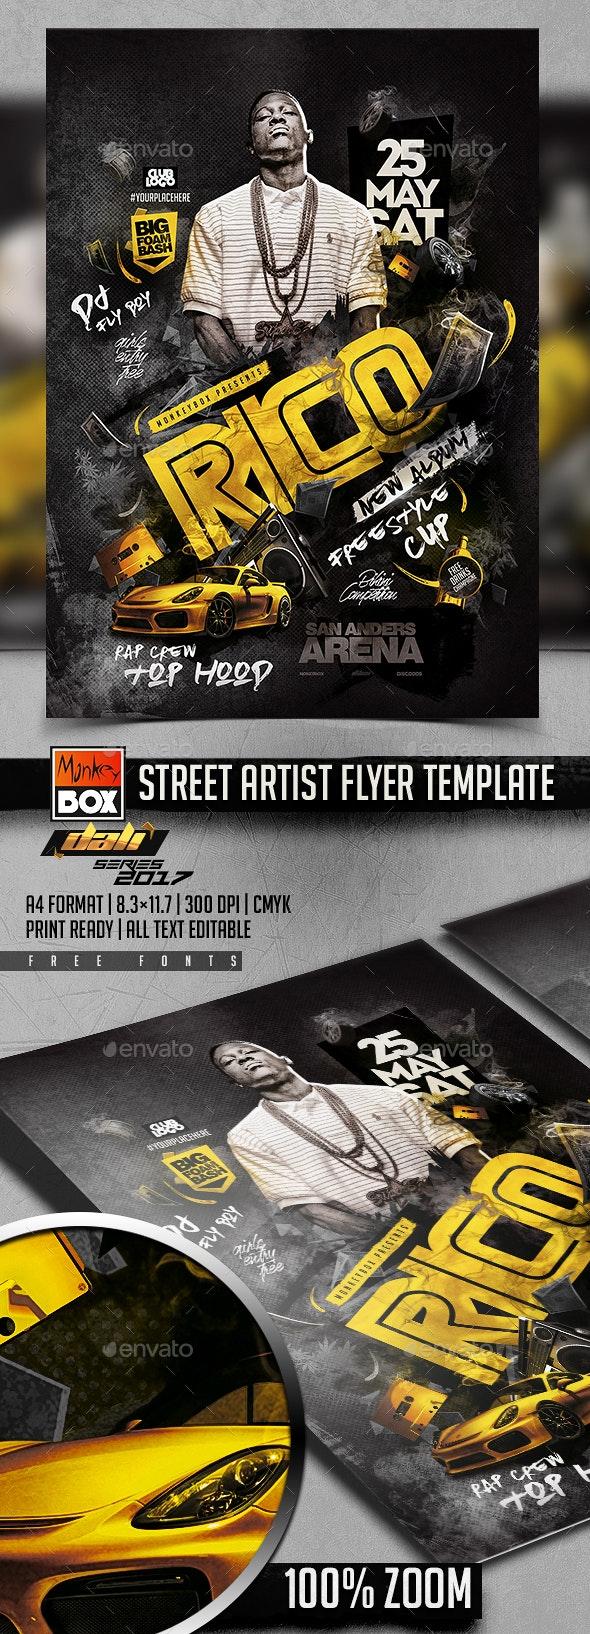 Street Artist Flyer Template - Events Flyers